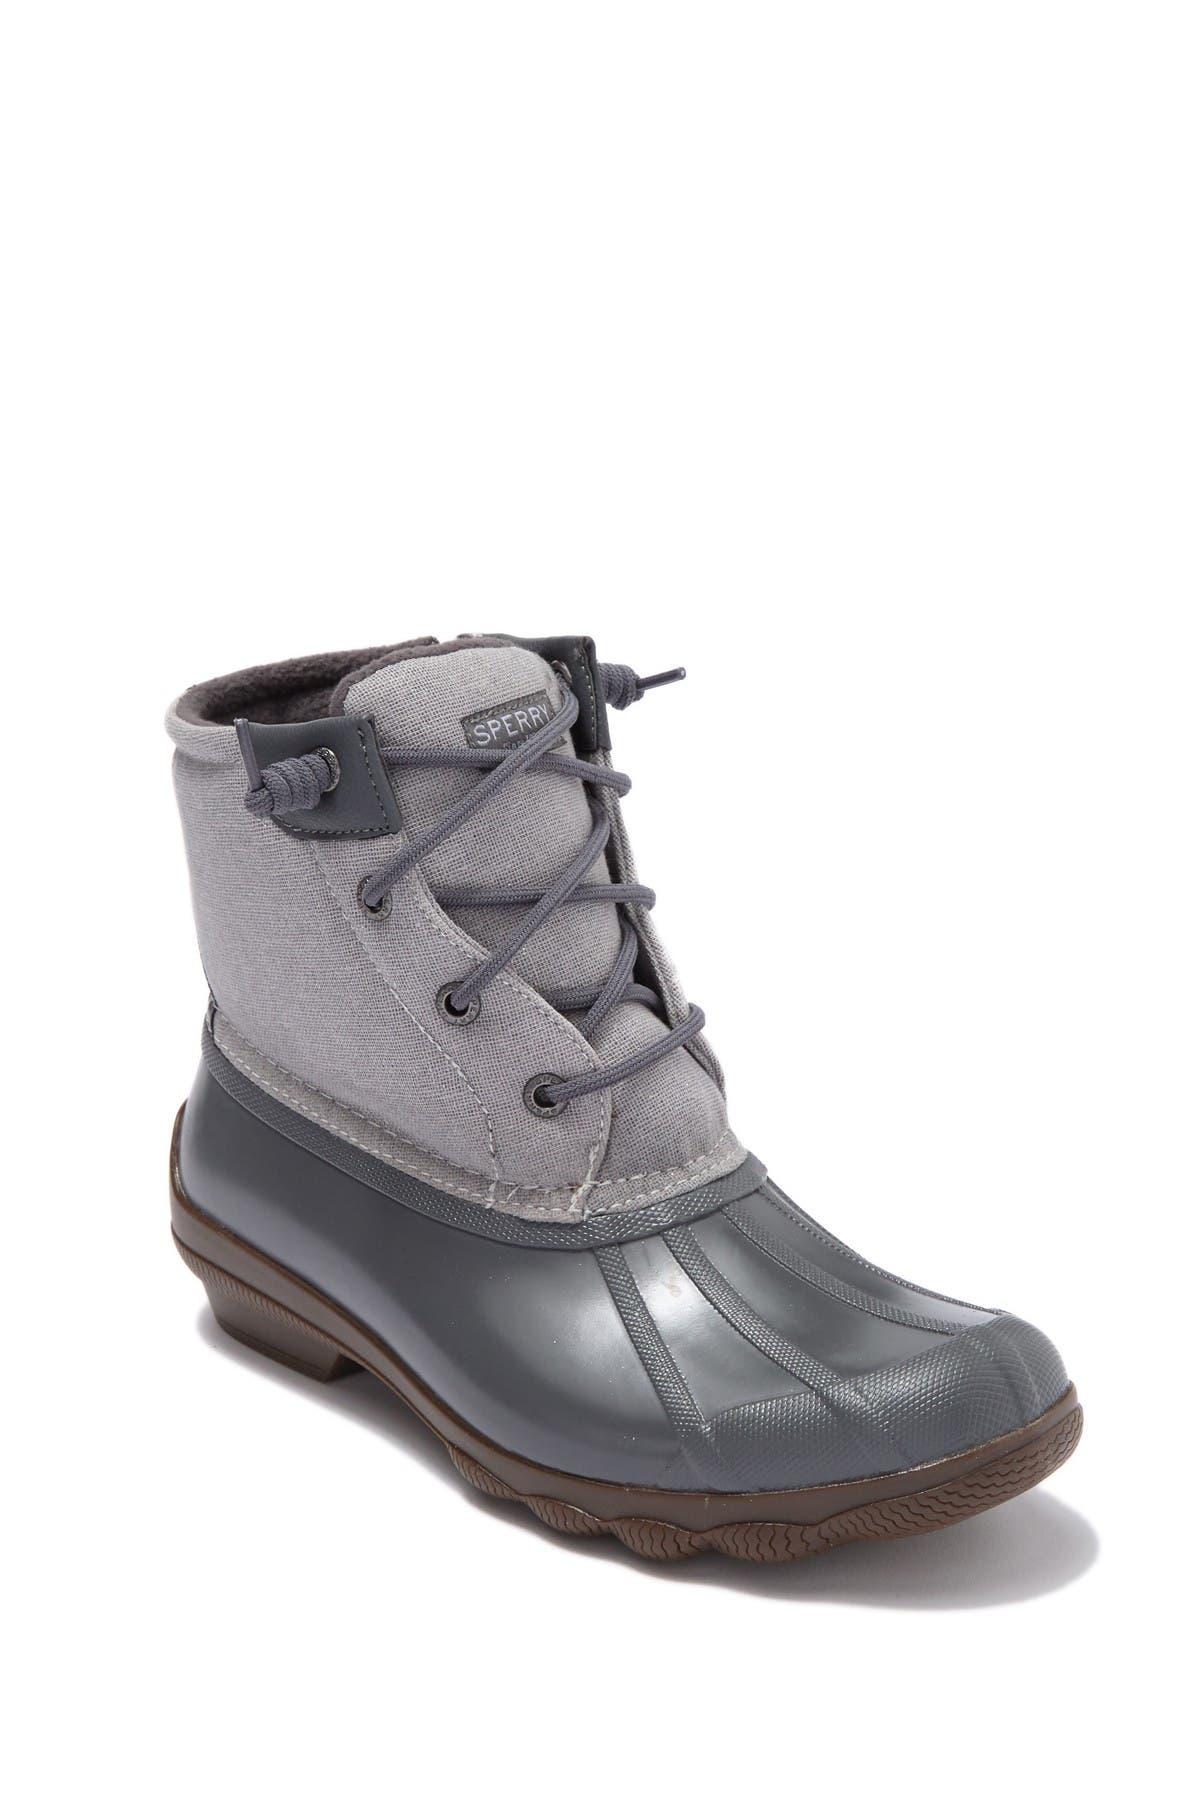 Syren Metallic Canvas Duck Boot